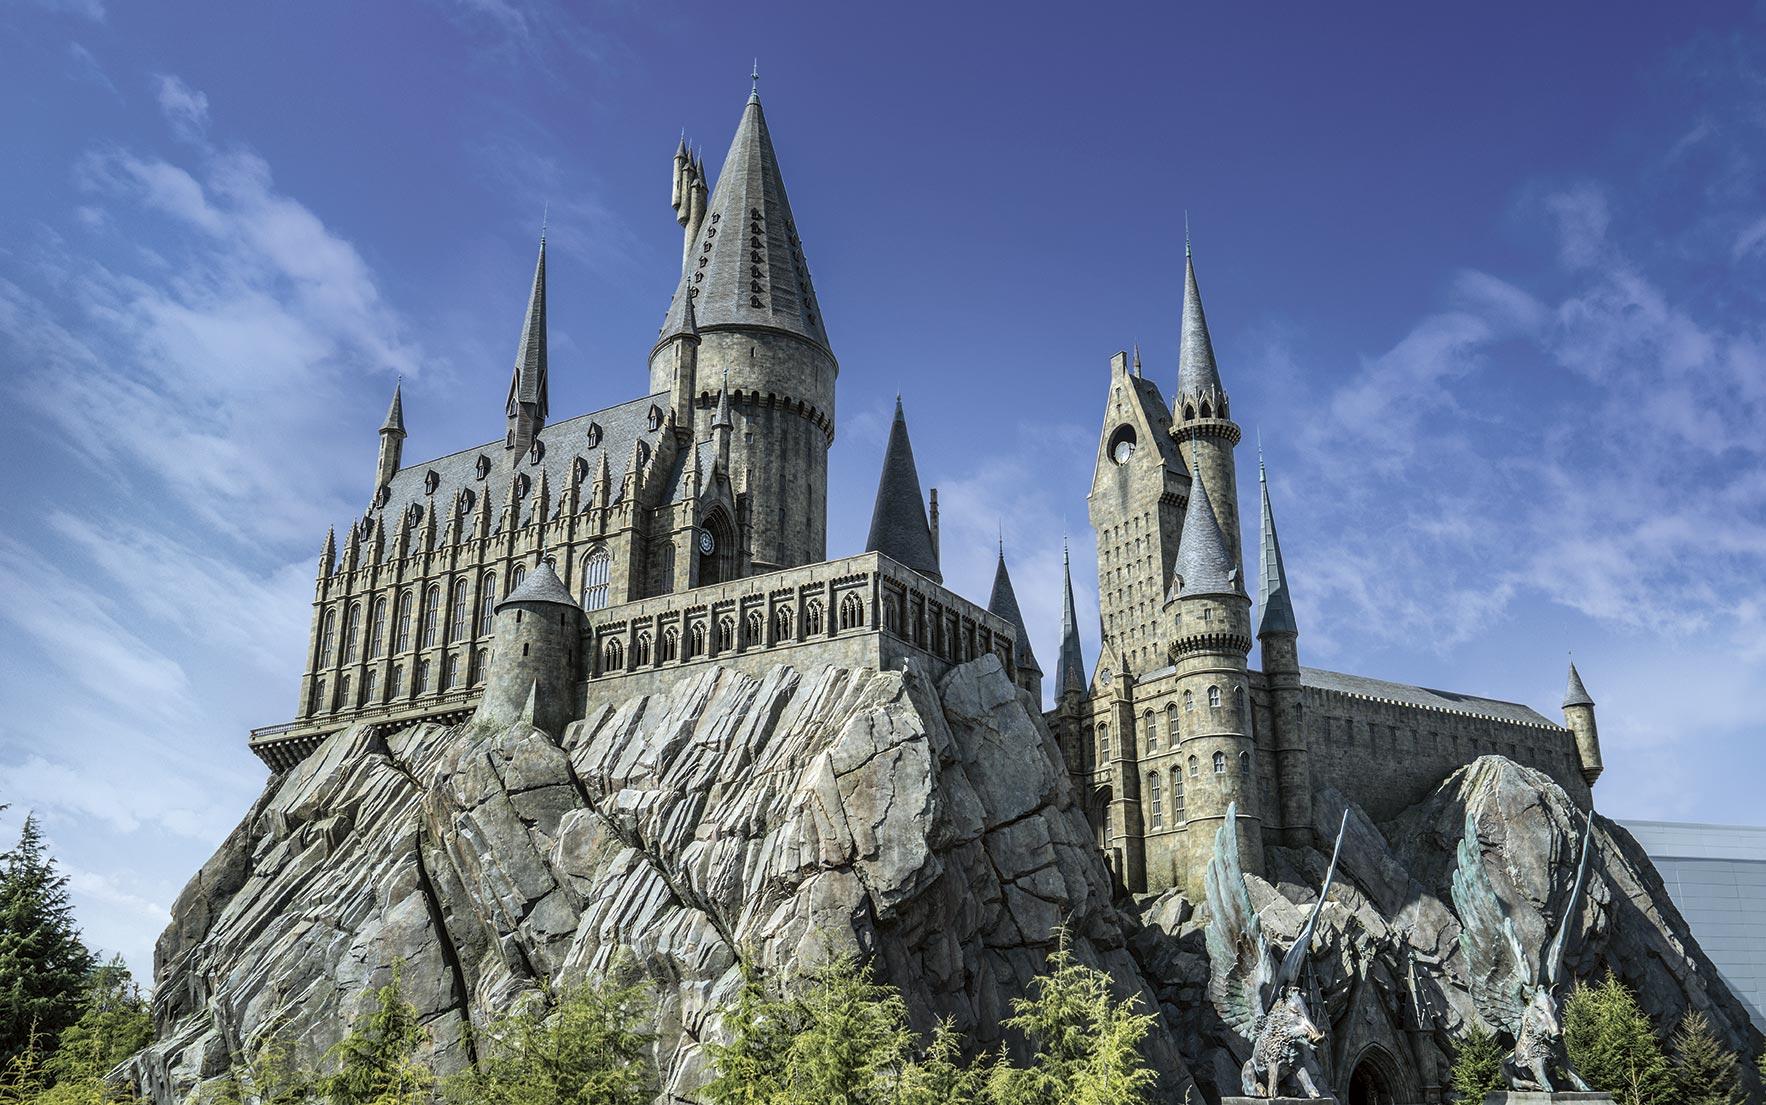 Universal Studios Japan Harry Potter Wizarding World